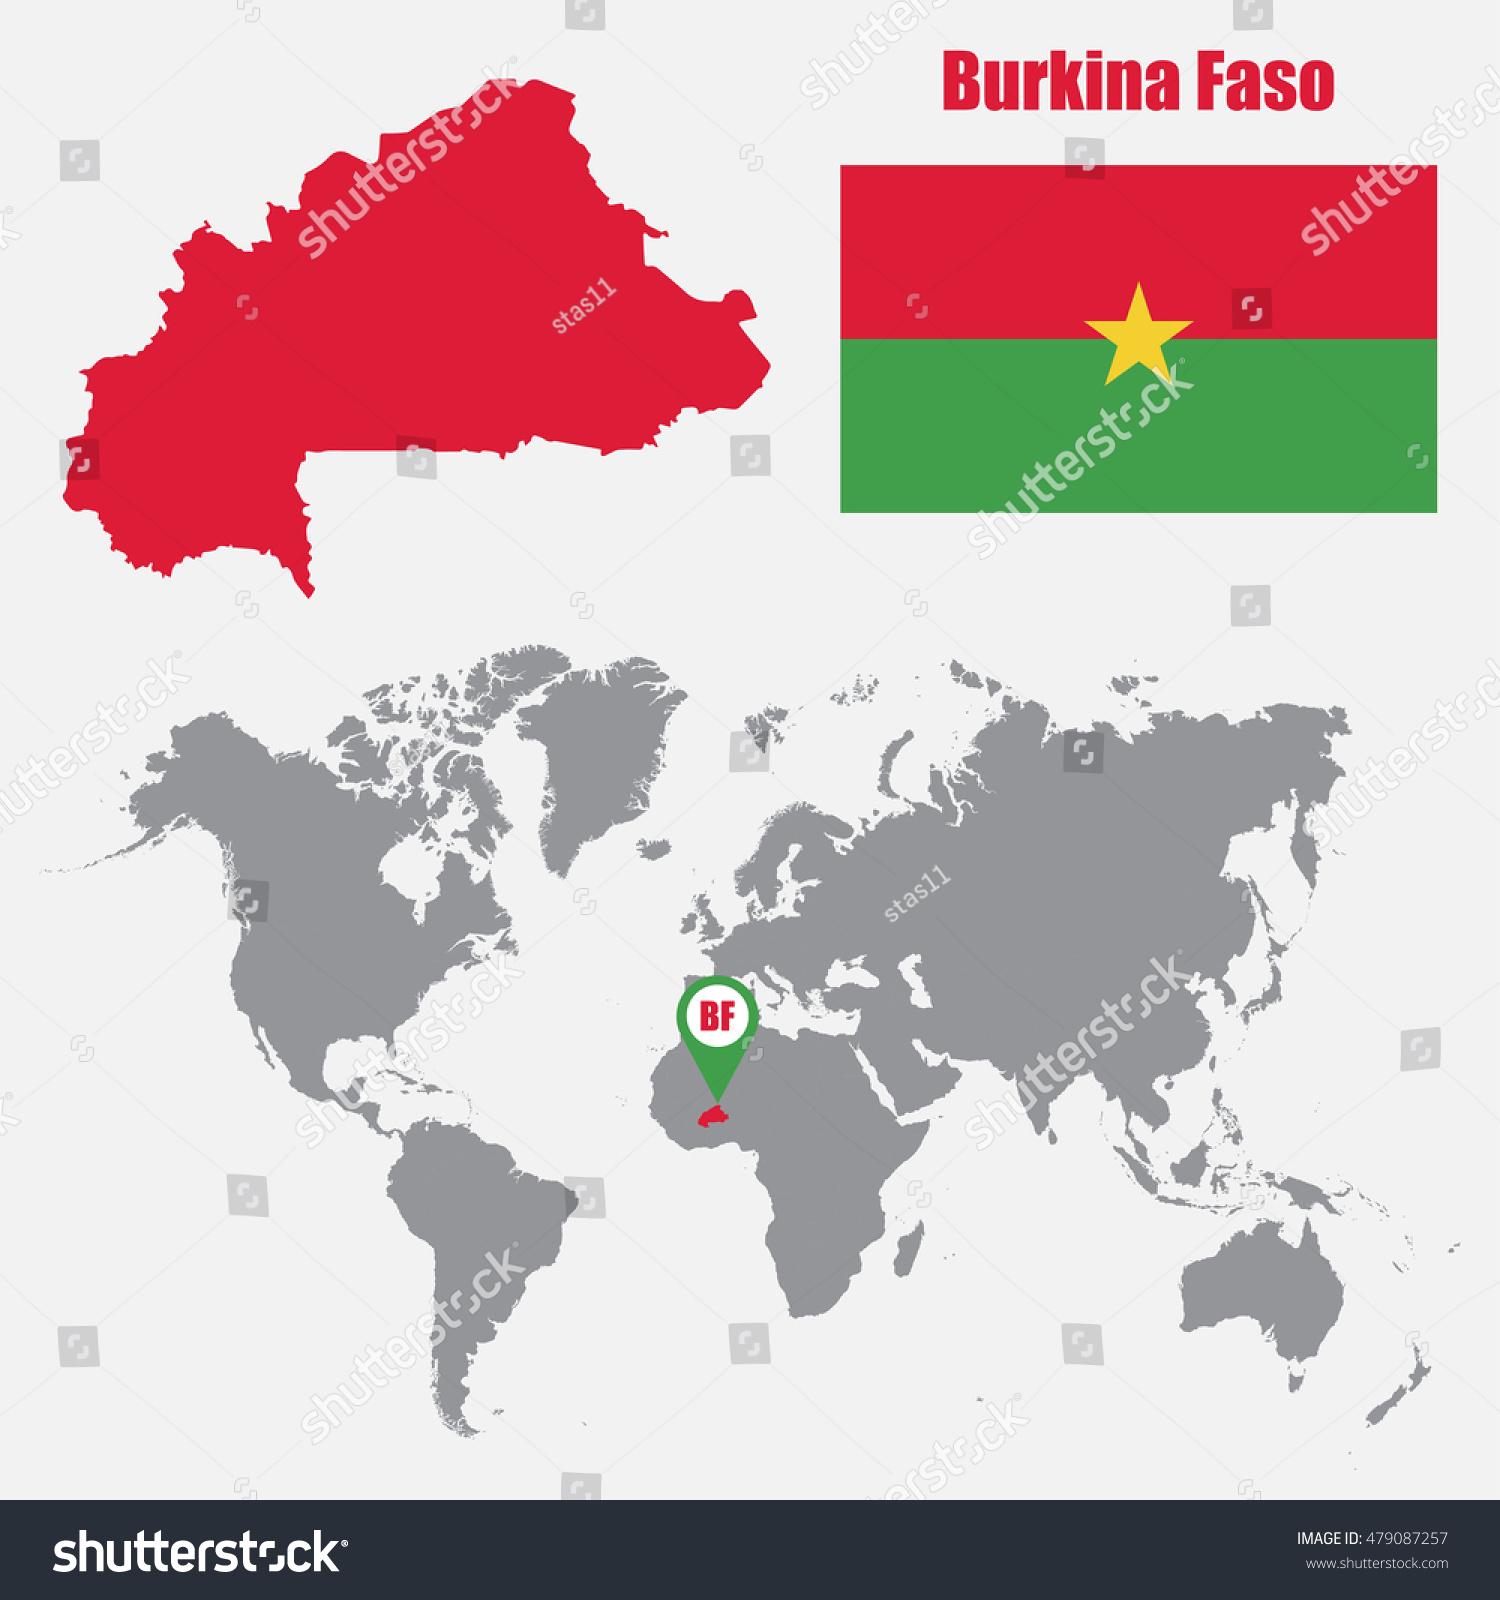 Burkina Faso Map On World Map Stock Vector Royalty Free 479087257